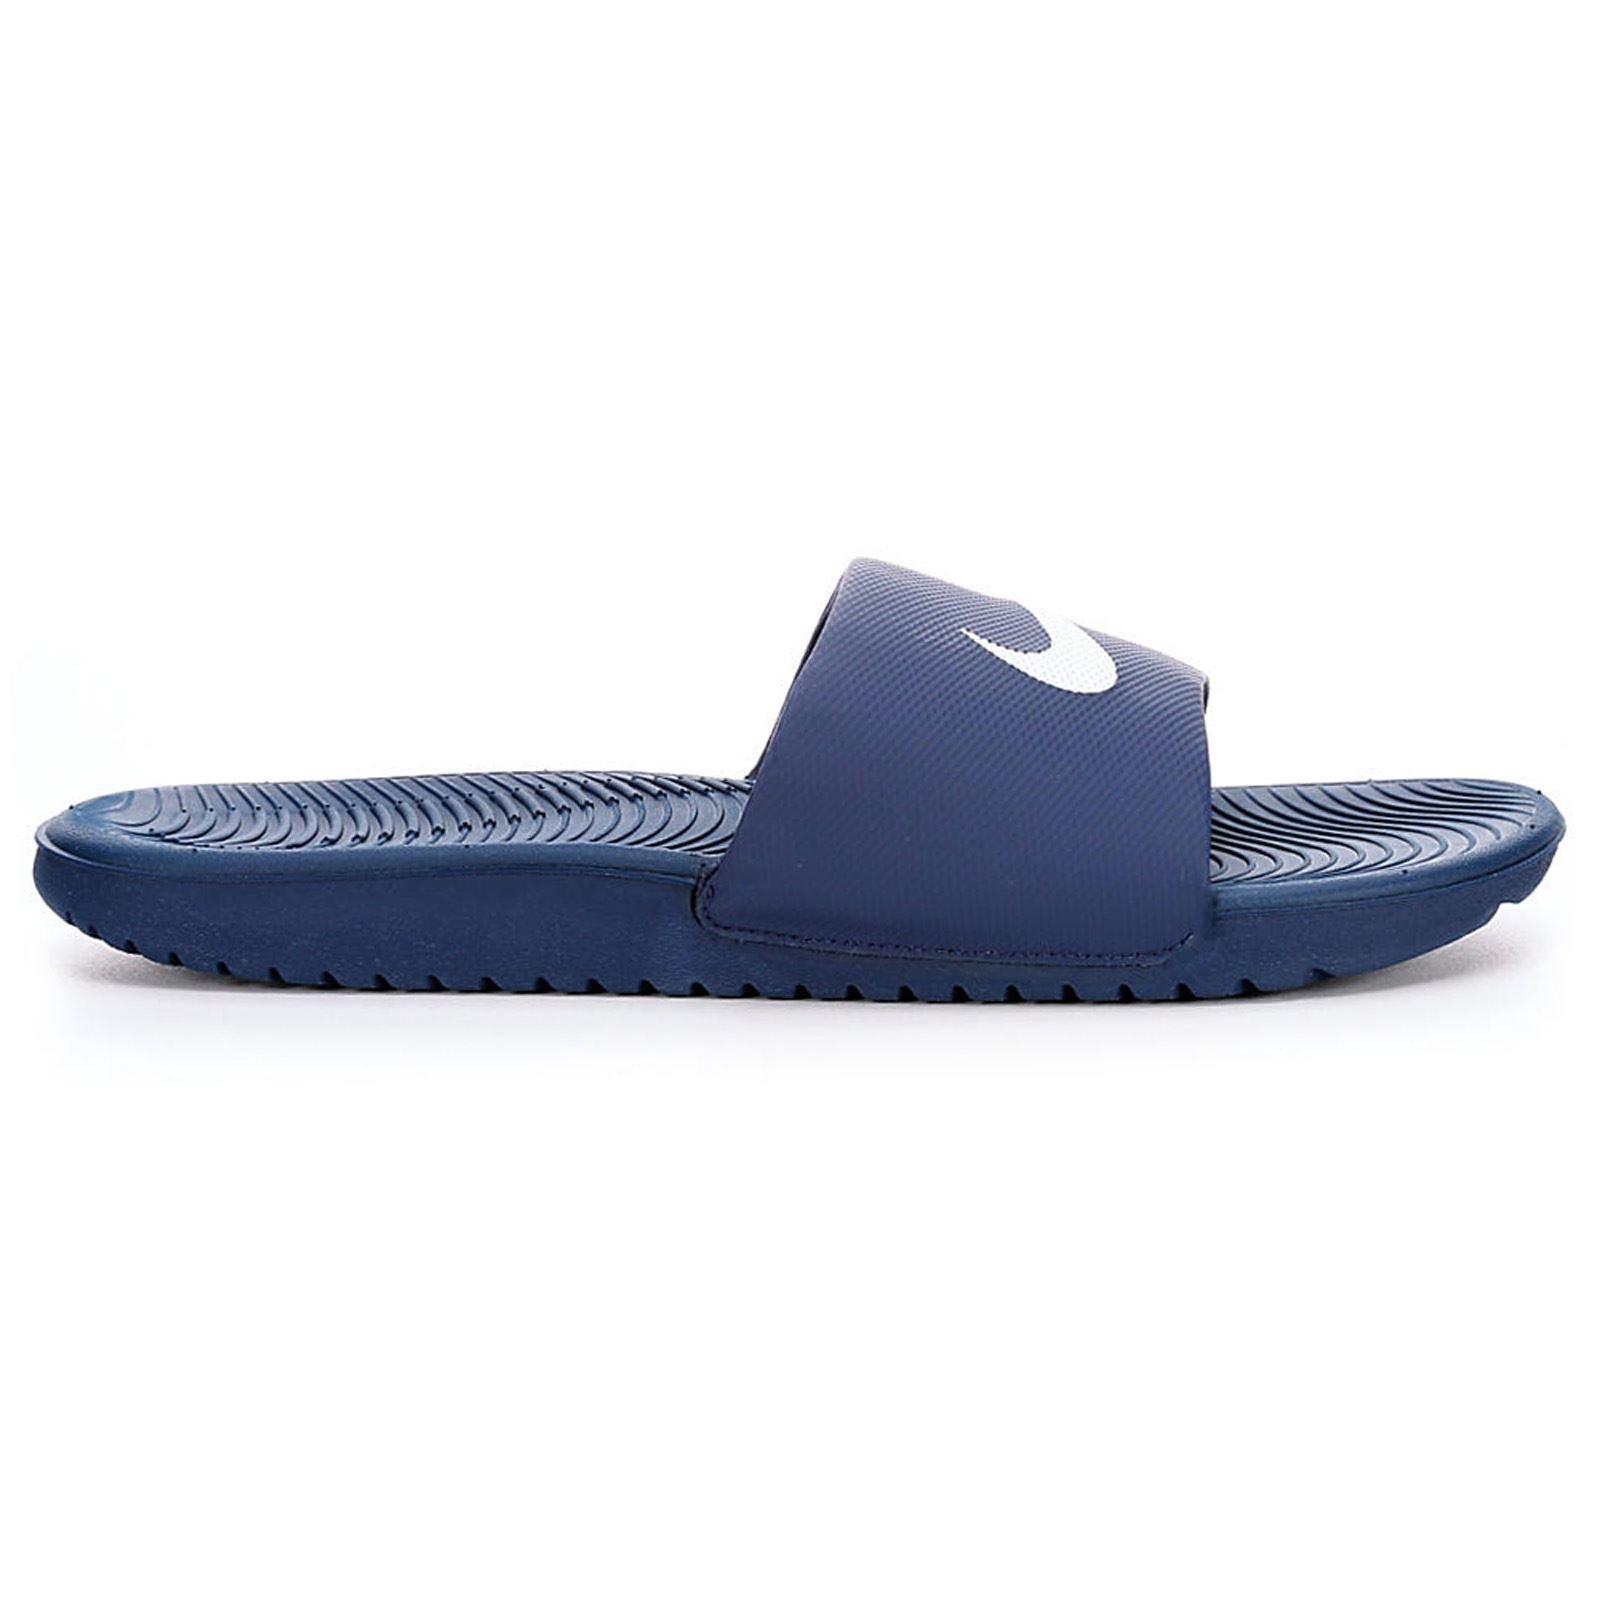 8f8f102e93bcc5 Galleon - Nike Men s Kawa Slide Athletic Sandal Midnight Navy White 10 D US